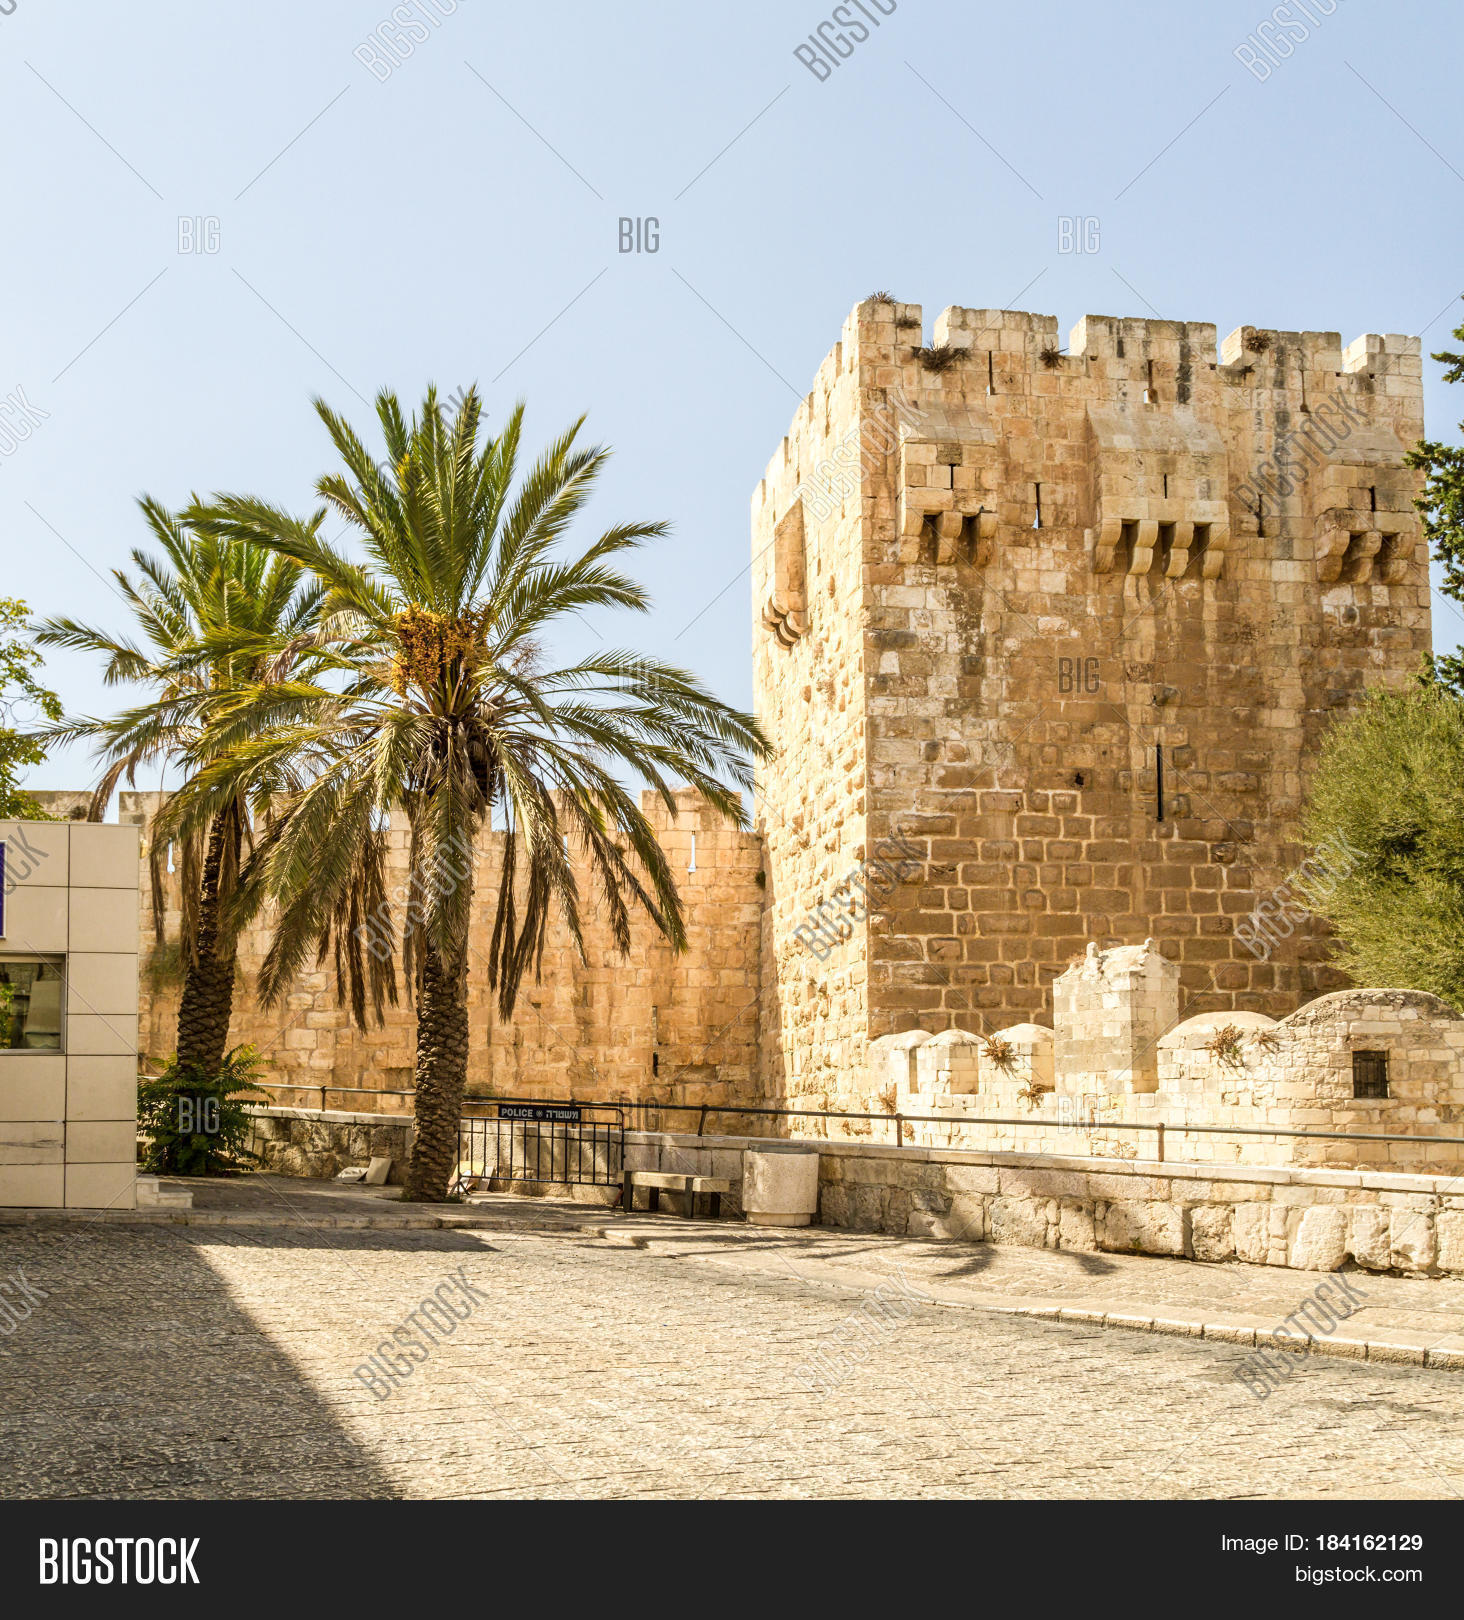 Jerusalem Citadel, Image & Photo (Free Trial) | Bigstock